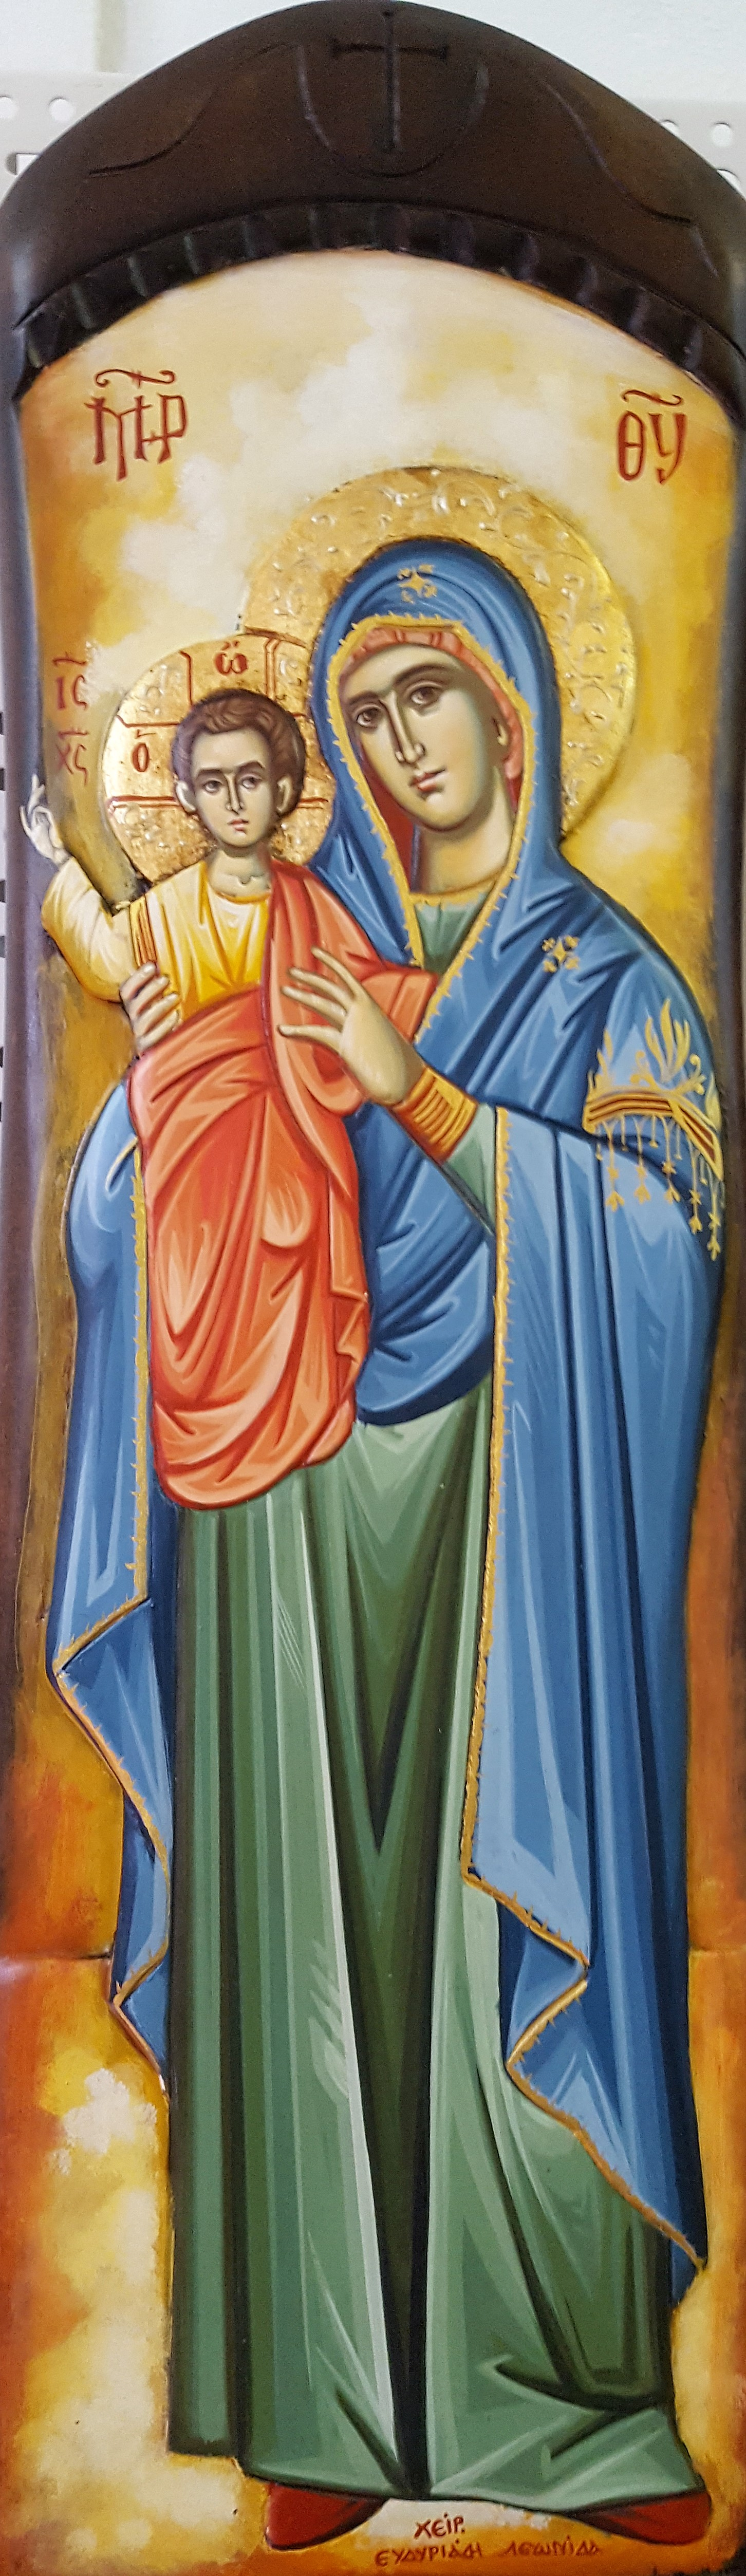 Regina degli Apostoli_Queen of Apostles_Reina de los Apostoles